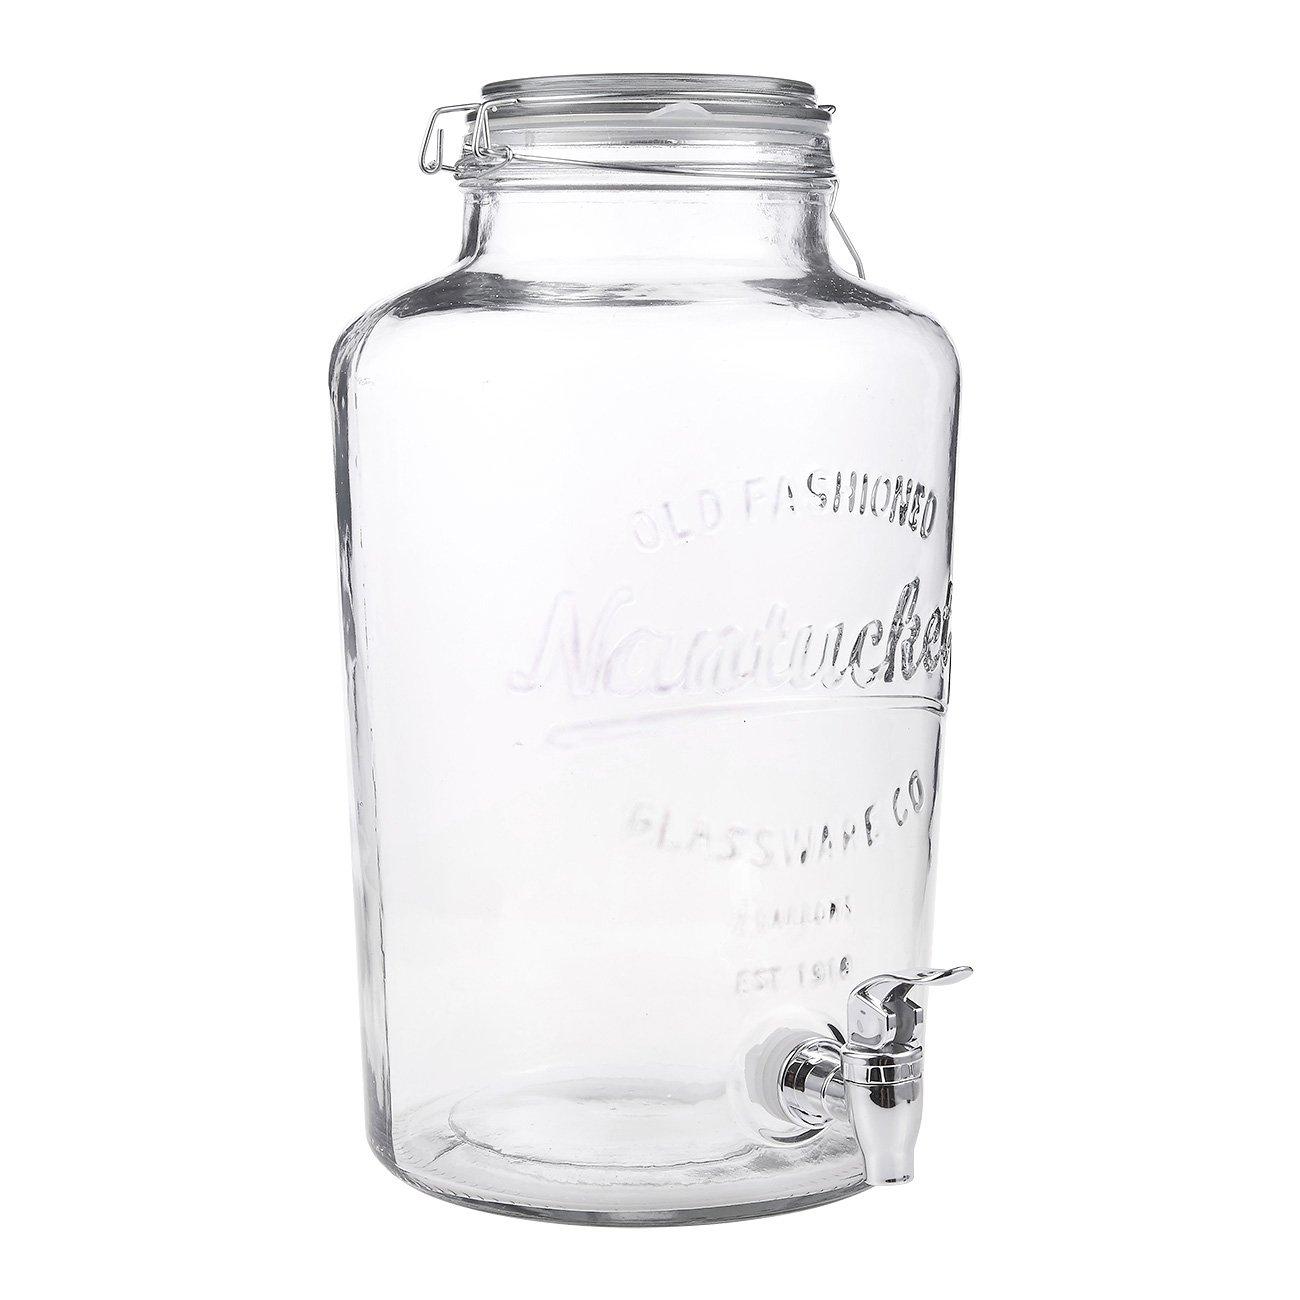 8 Liter/ 2 Gallon Mason Jar Drink Dispenser - Glass Beverage Dispenser with Spigot and Bail Lid Closure